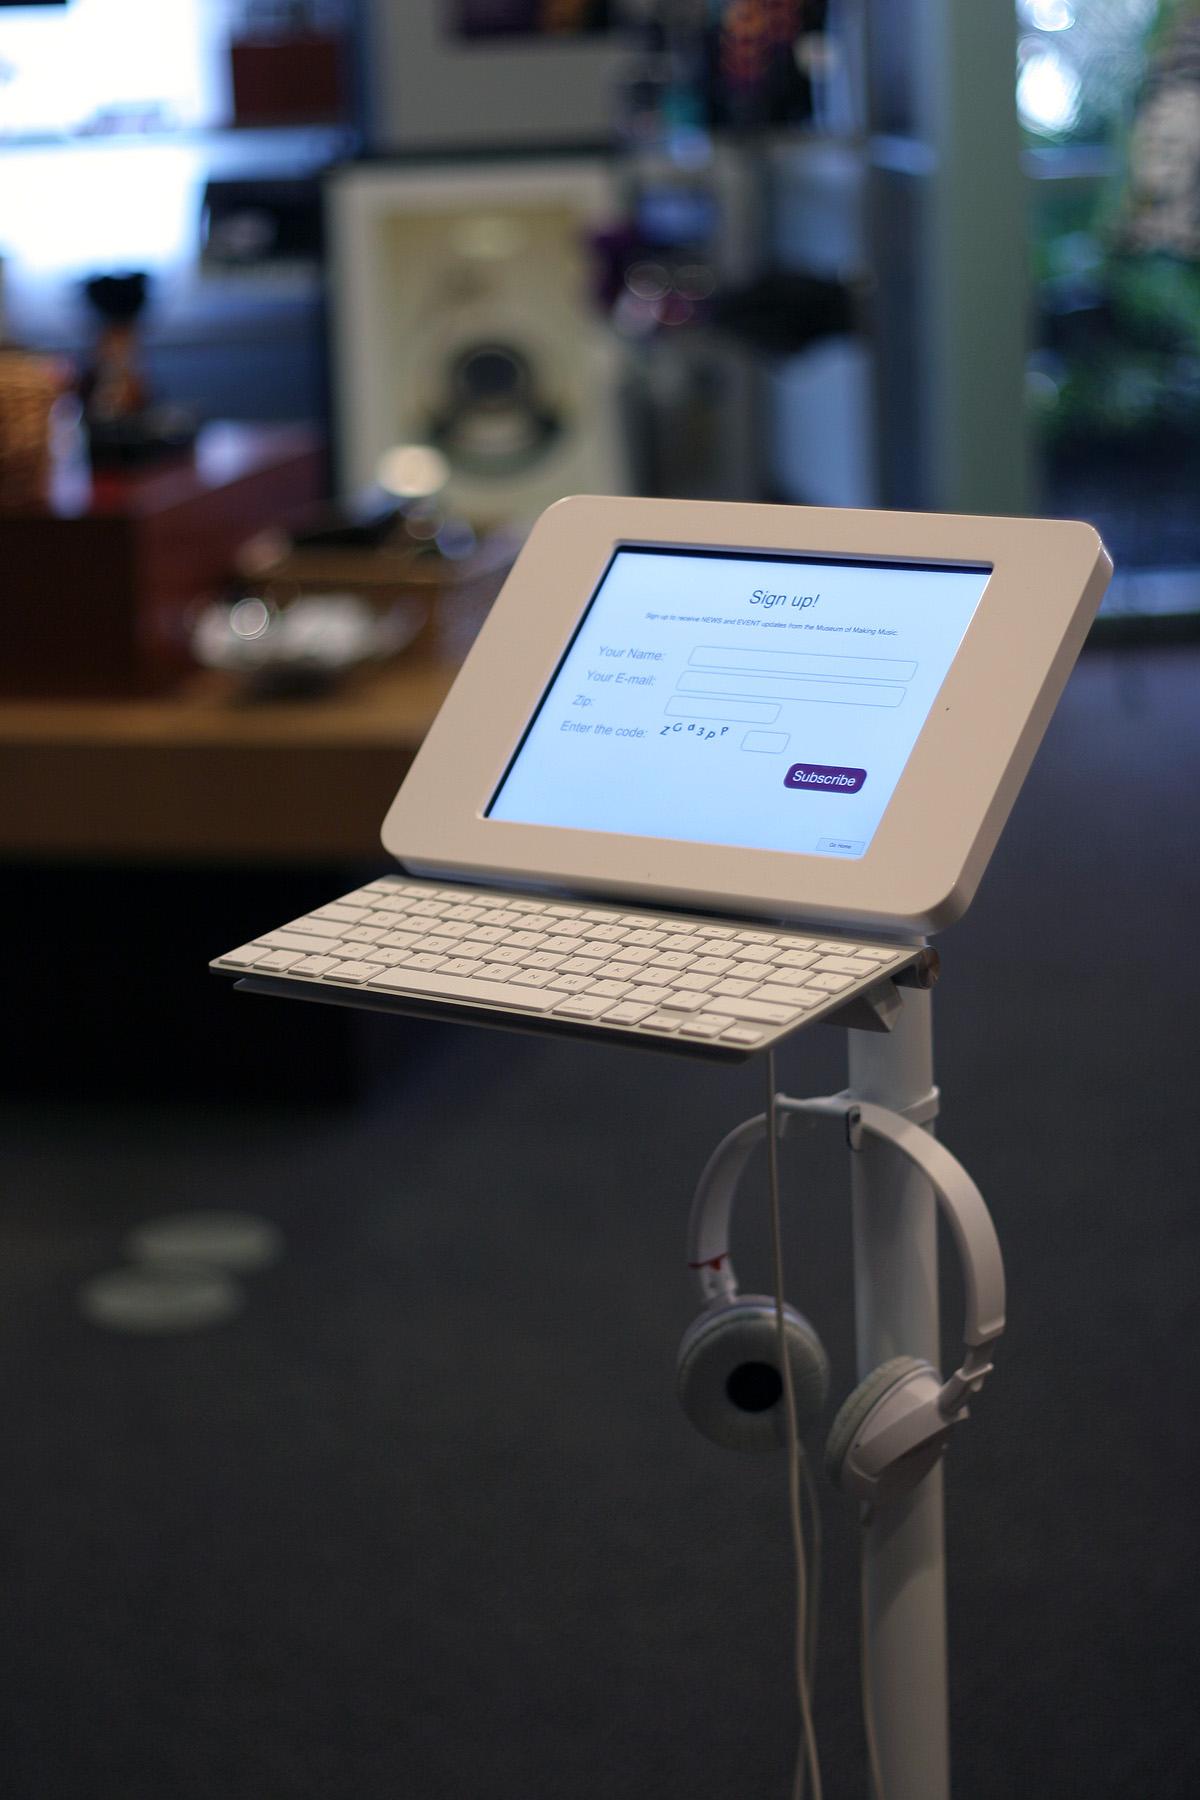 Lilitab S Wheeled Ipad Kiosk Provides Secure Medical Mobility